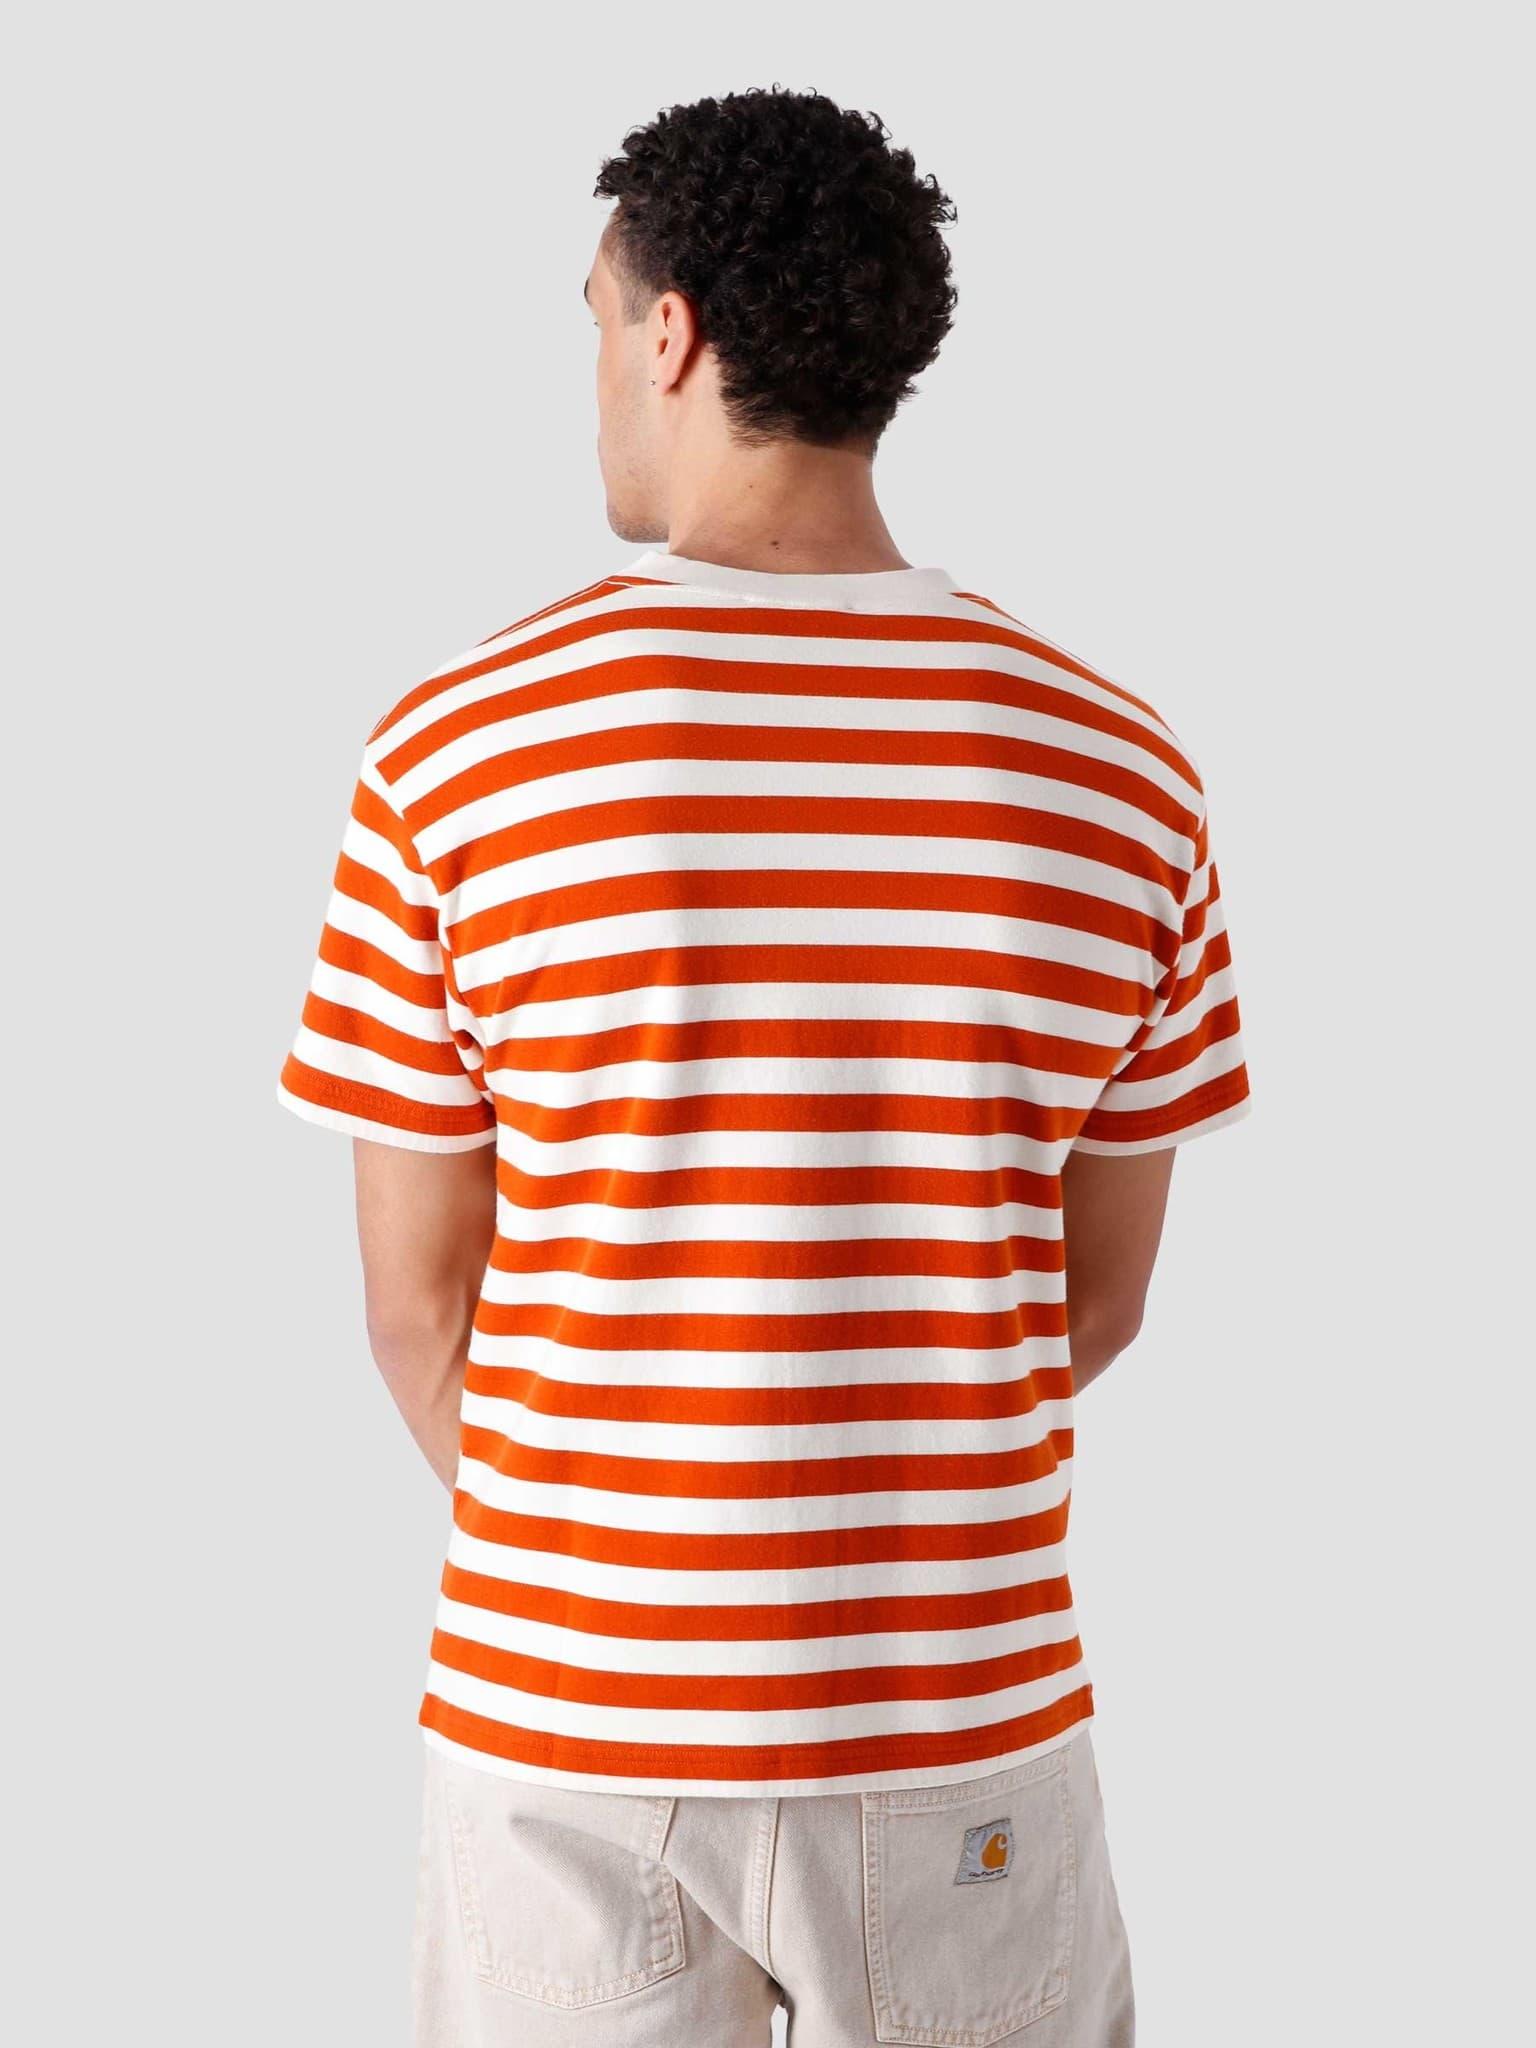 Stripe Sans T-Shirt White Orange